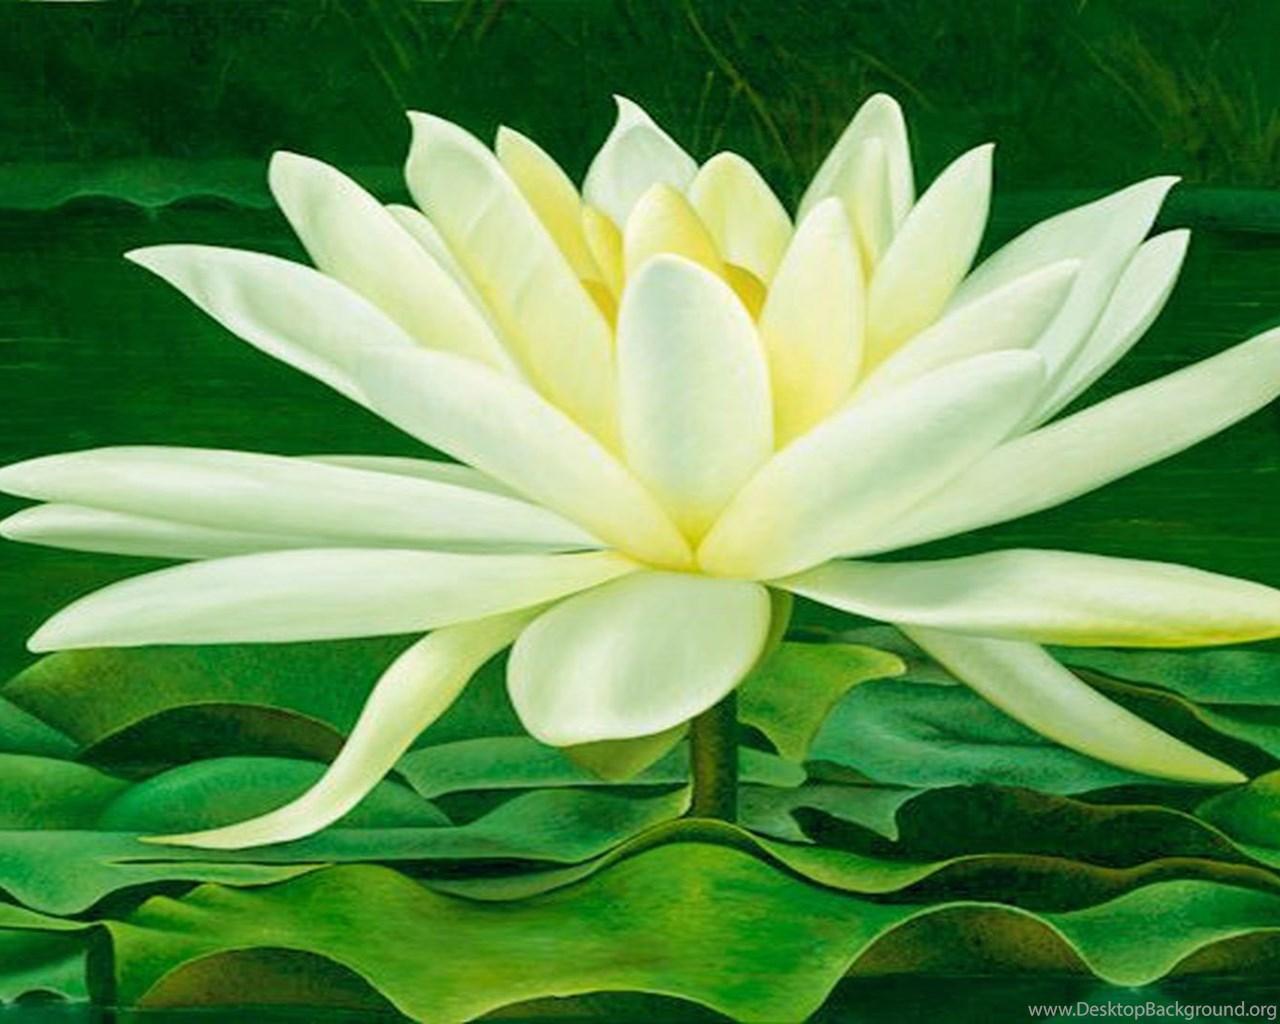 Magical Beauty Of Lotus Flower Wallpapers Free Wall Paper Desktop